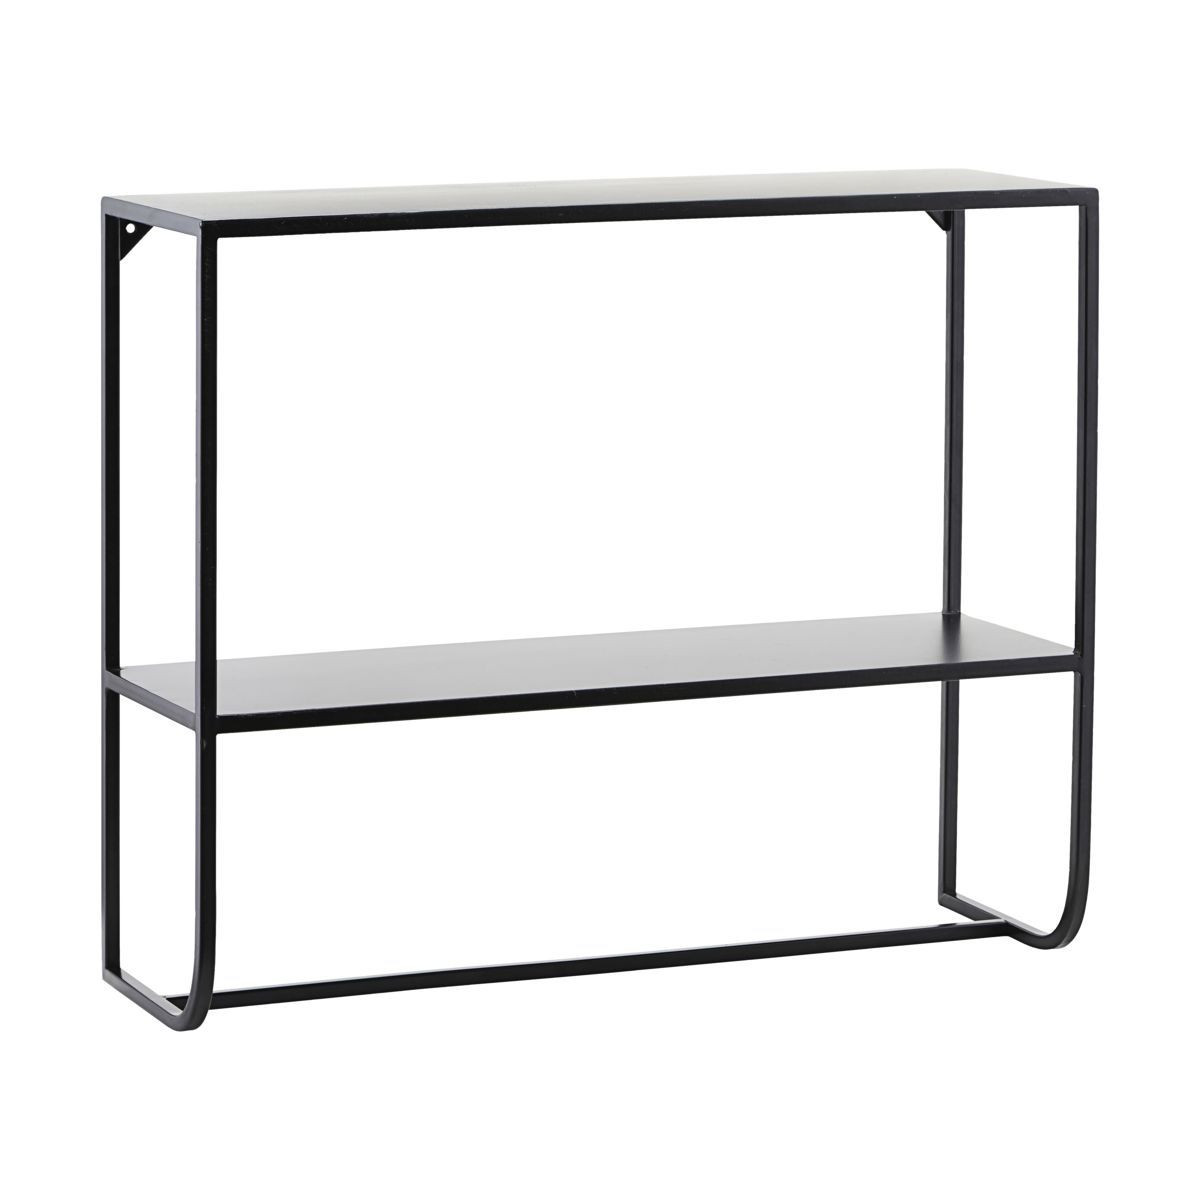 Wall Shelf Prove | Black